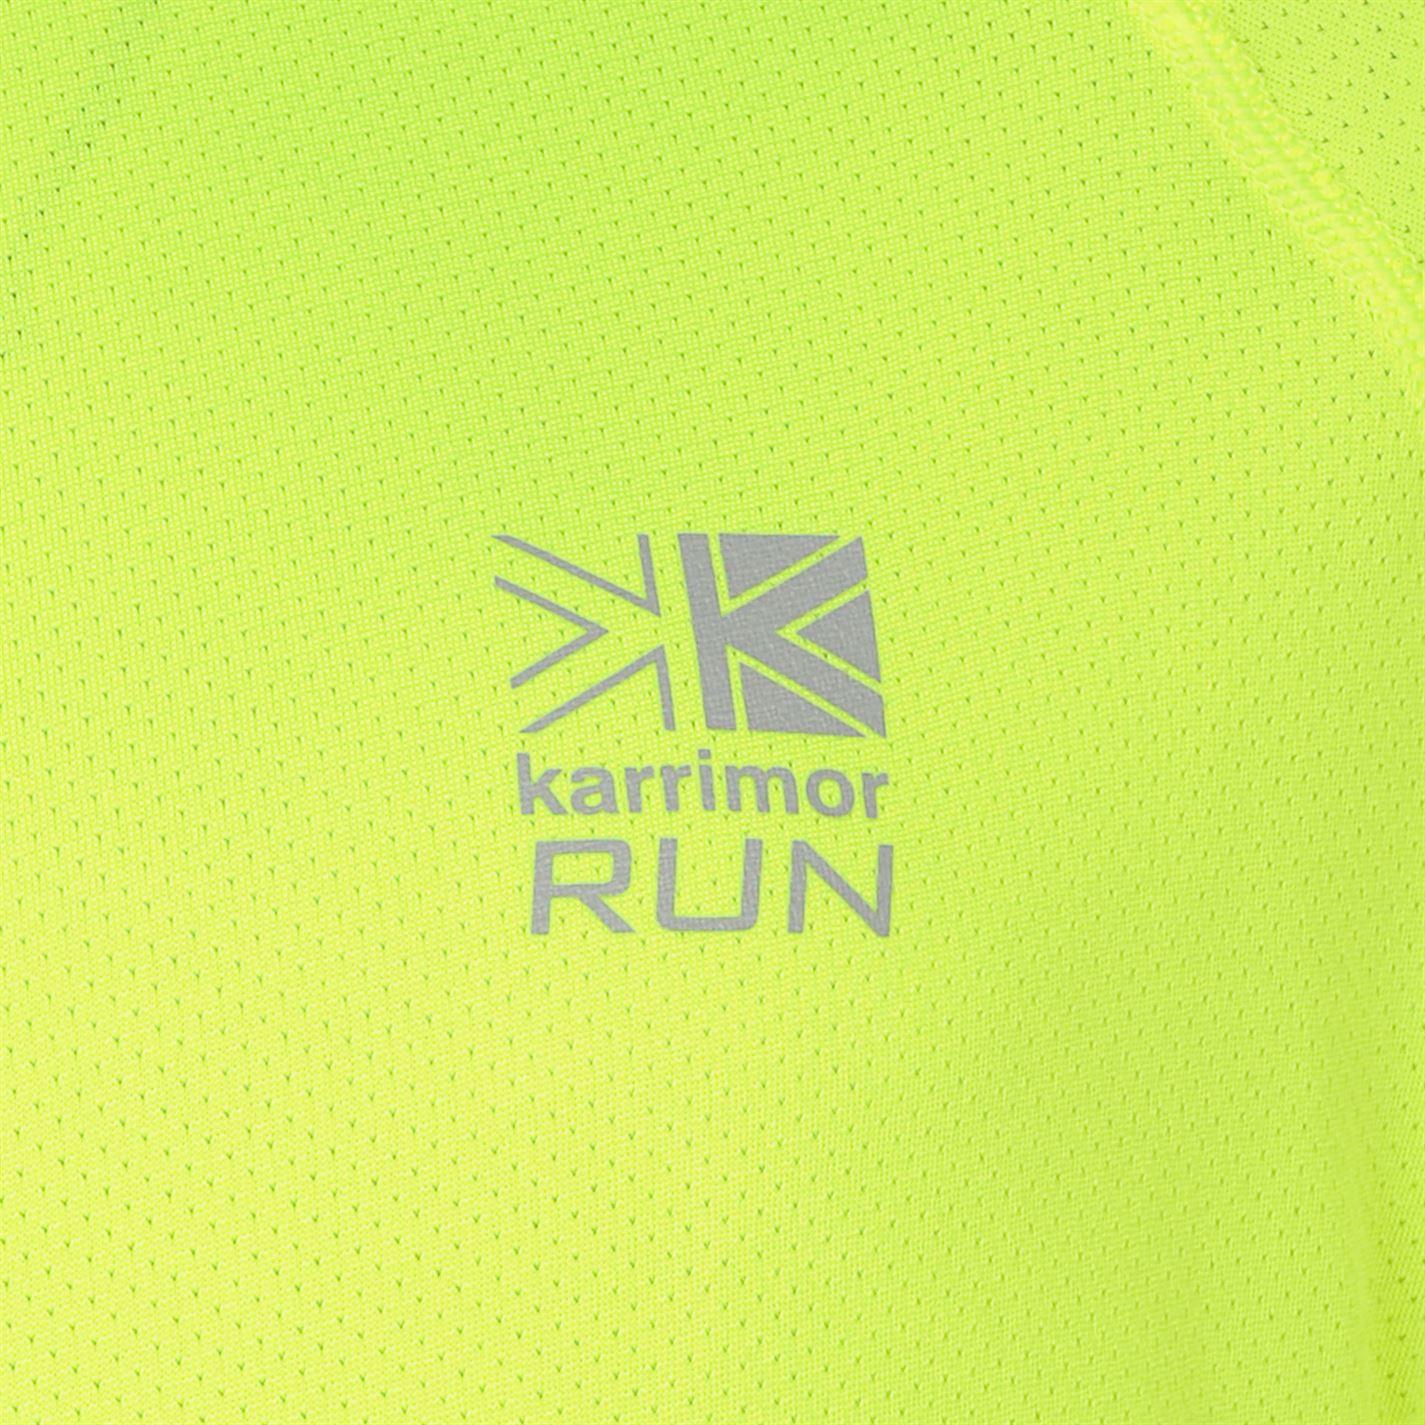 Karrimor-Correr-Mens-X-Cremallera-Camiseta-Camiseta-Top-Transpirable-Ligero-Mentonera miniatura 13